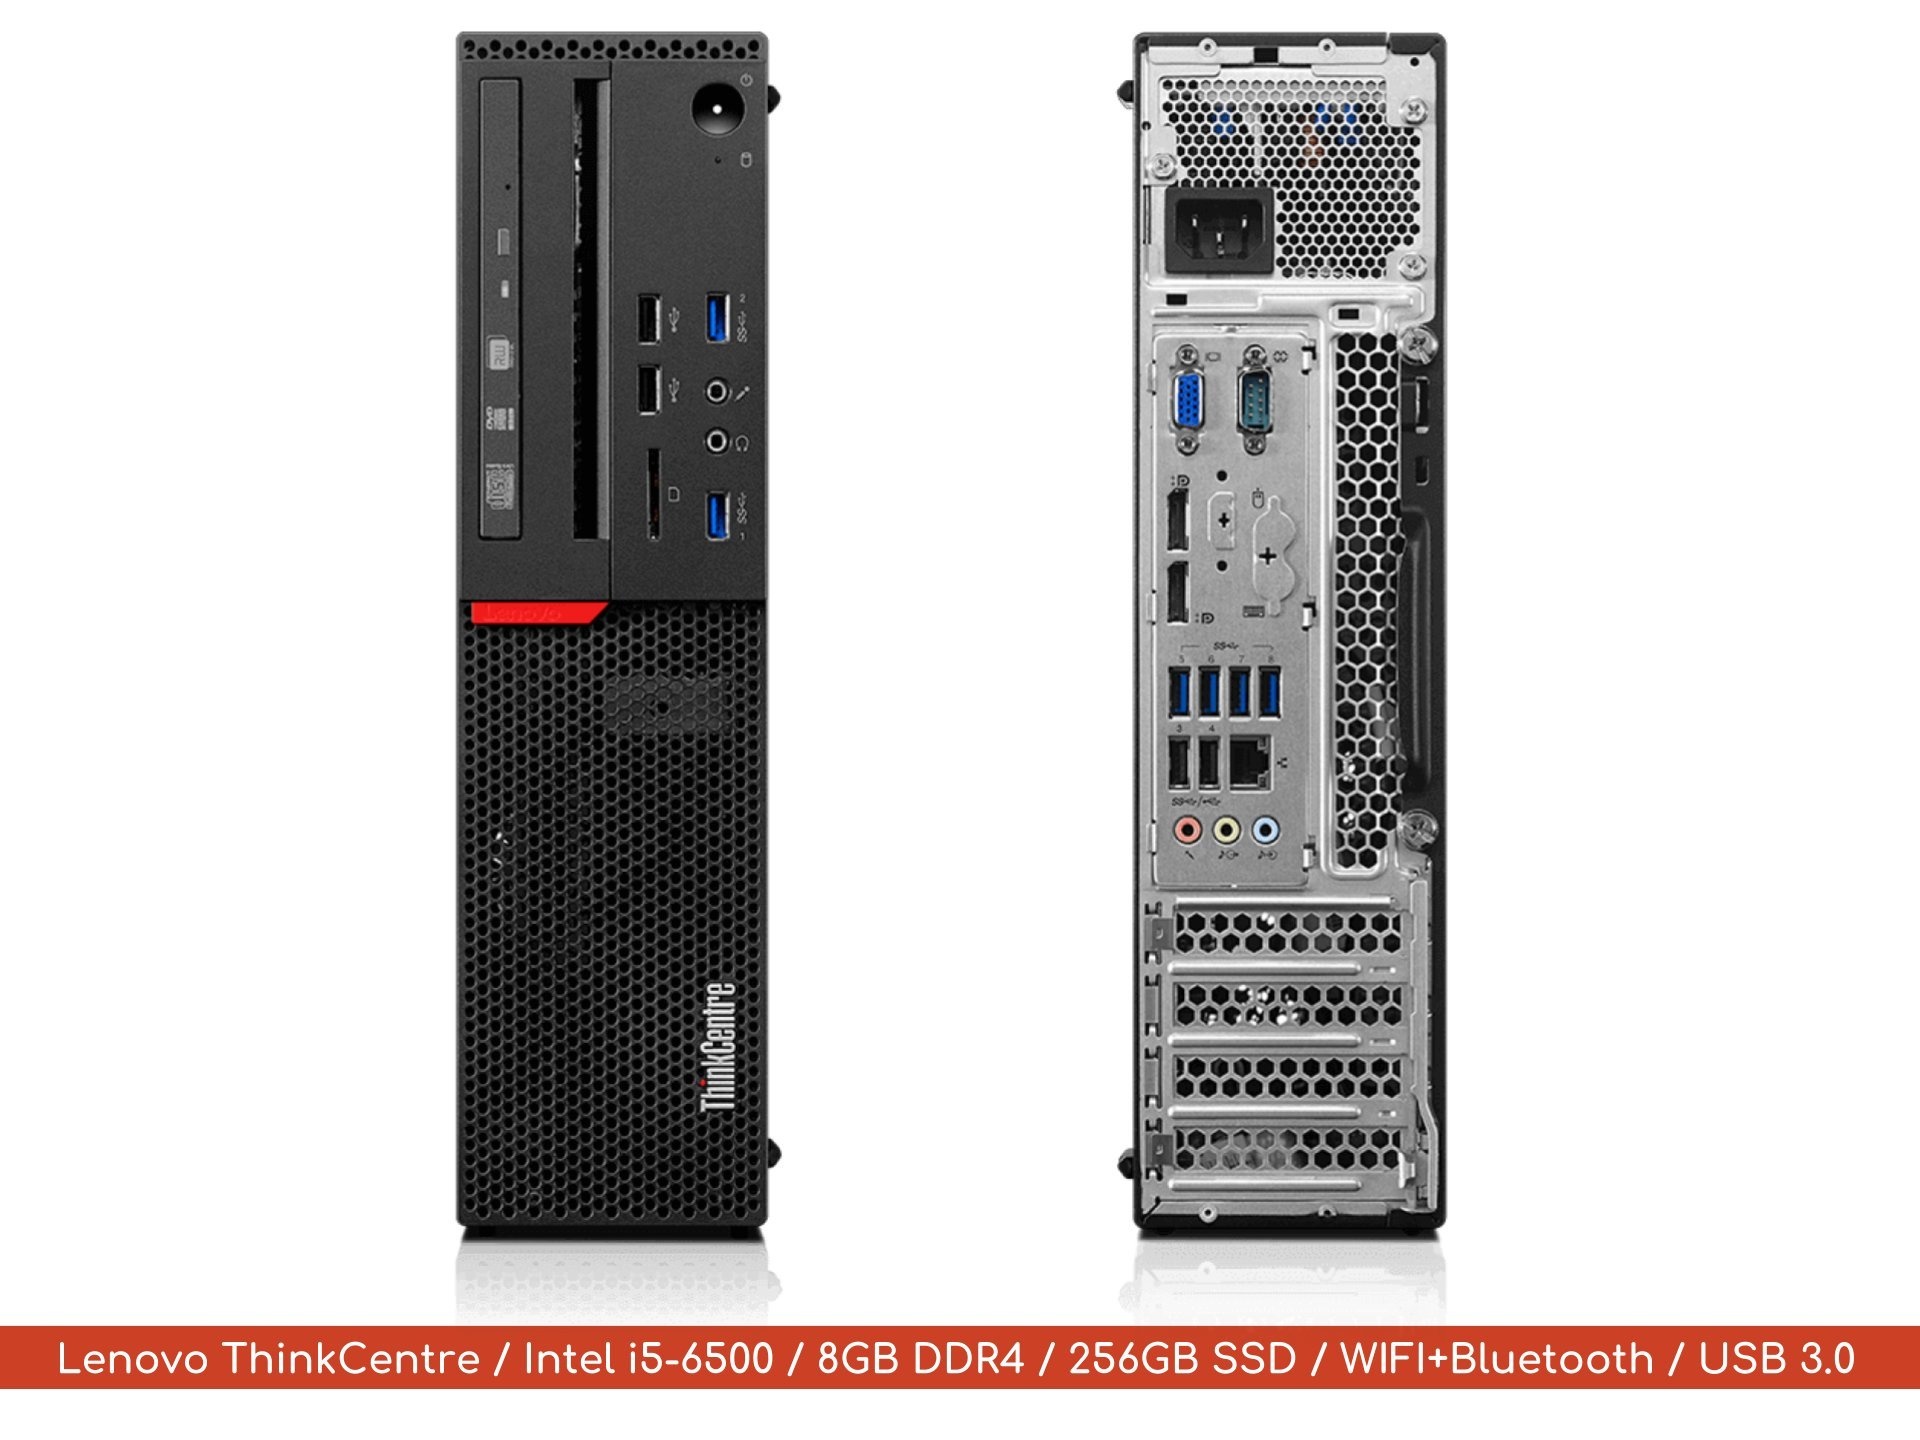 Lenovo ThinkCentre i5 8GB 256GB Quad Core Desktop | 2018 Flagship Premium Military Level | Intel Core i5-6500 Up to 3.6Ghz | DDR4 | SSD | Windows 10 Professional | WIFI | Bluetooth | Keyboard | Mouse by Lenovo ThinkCentre